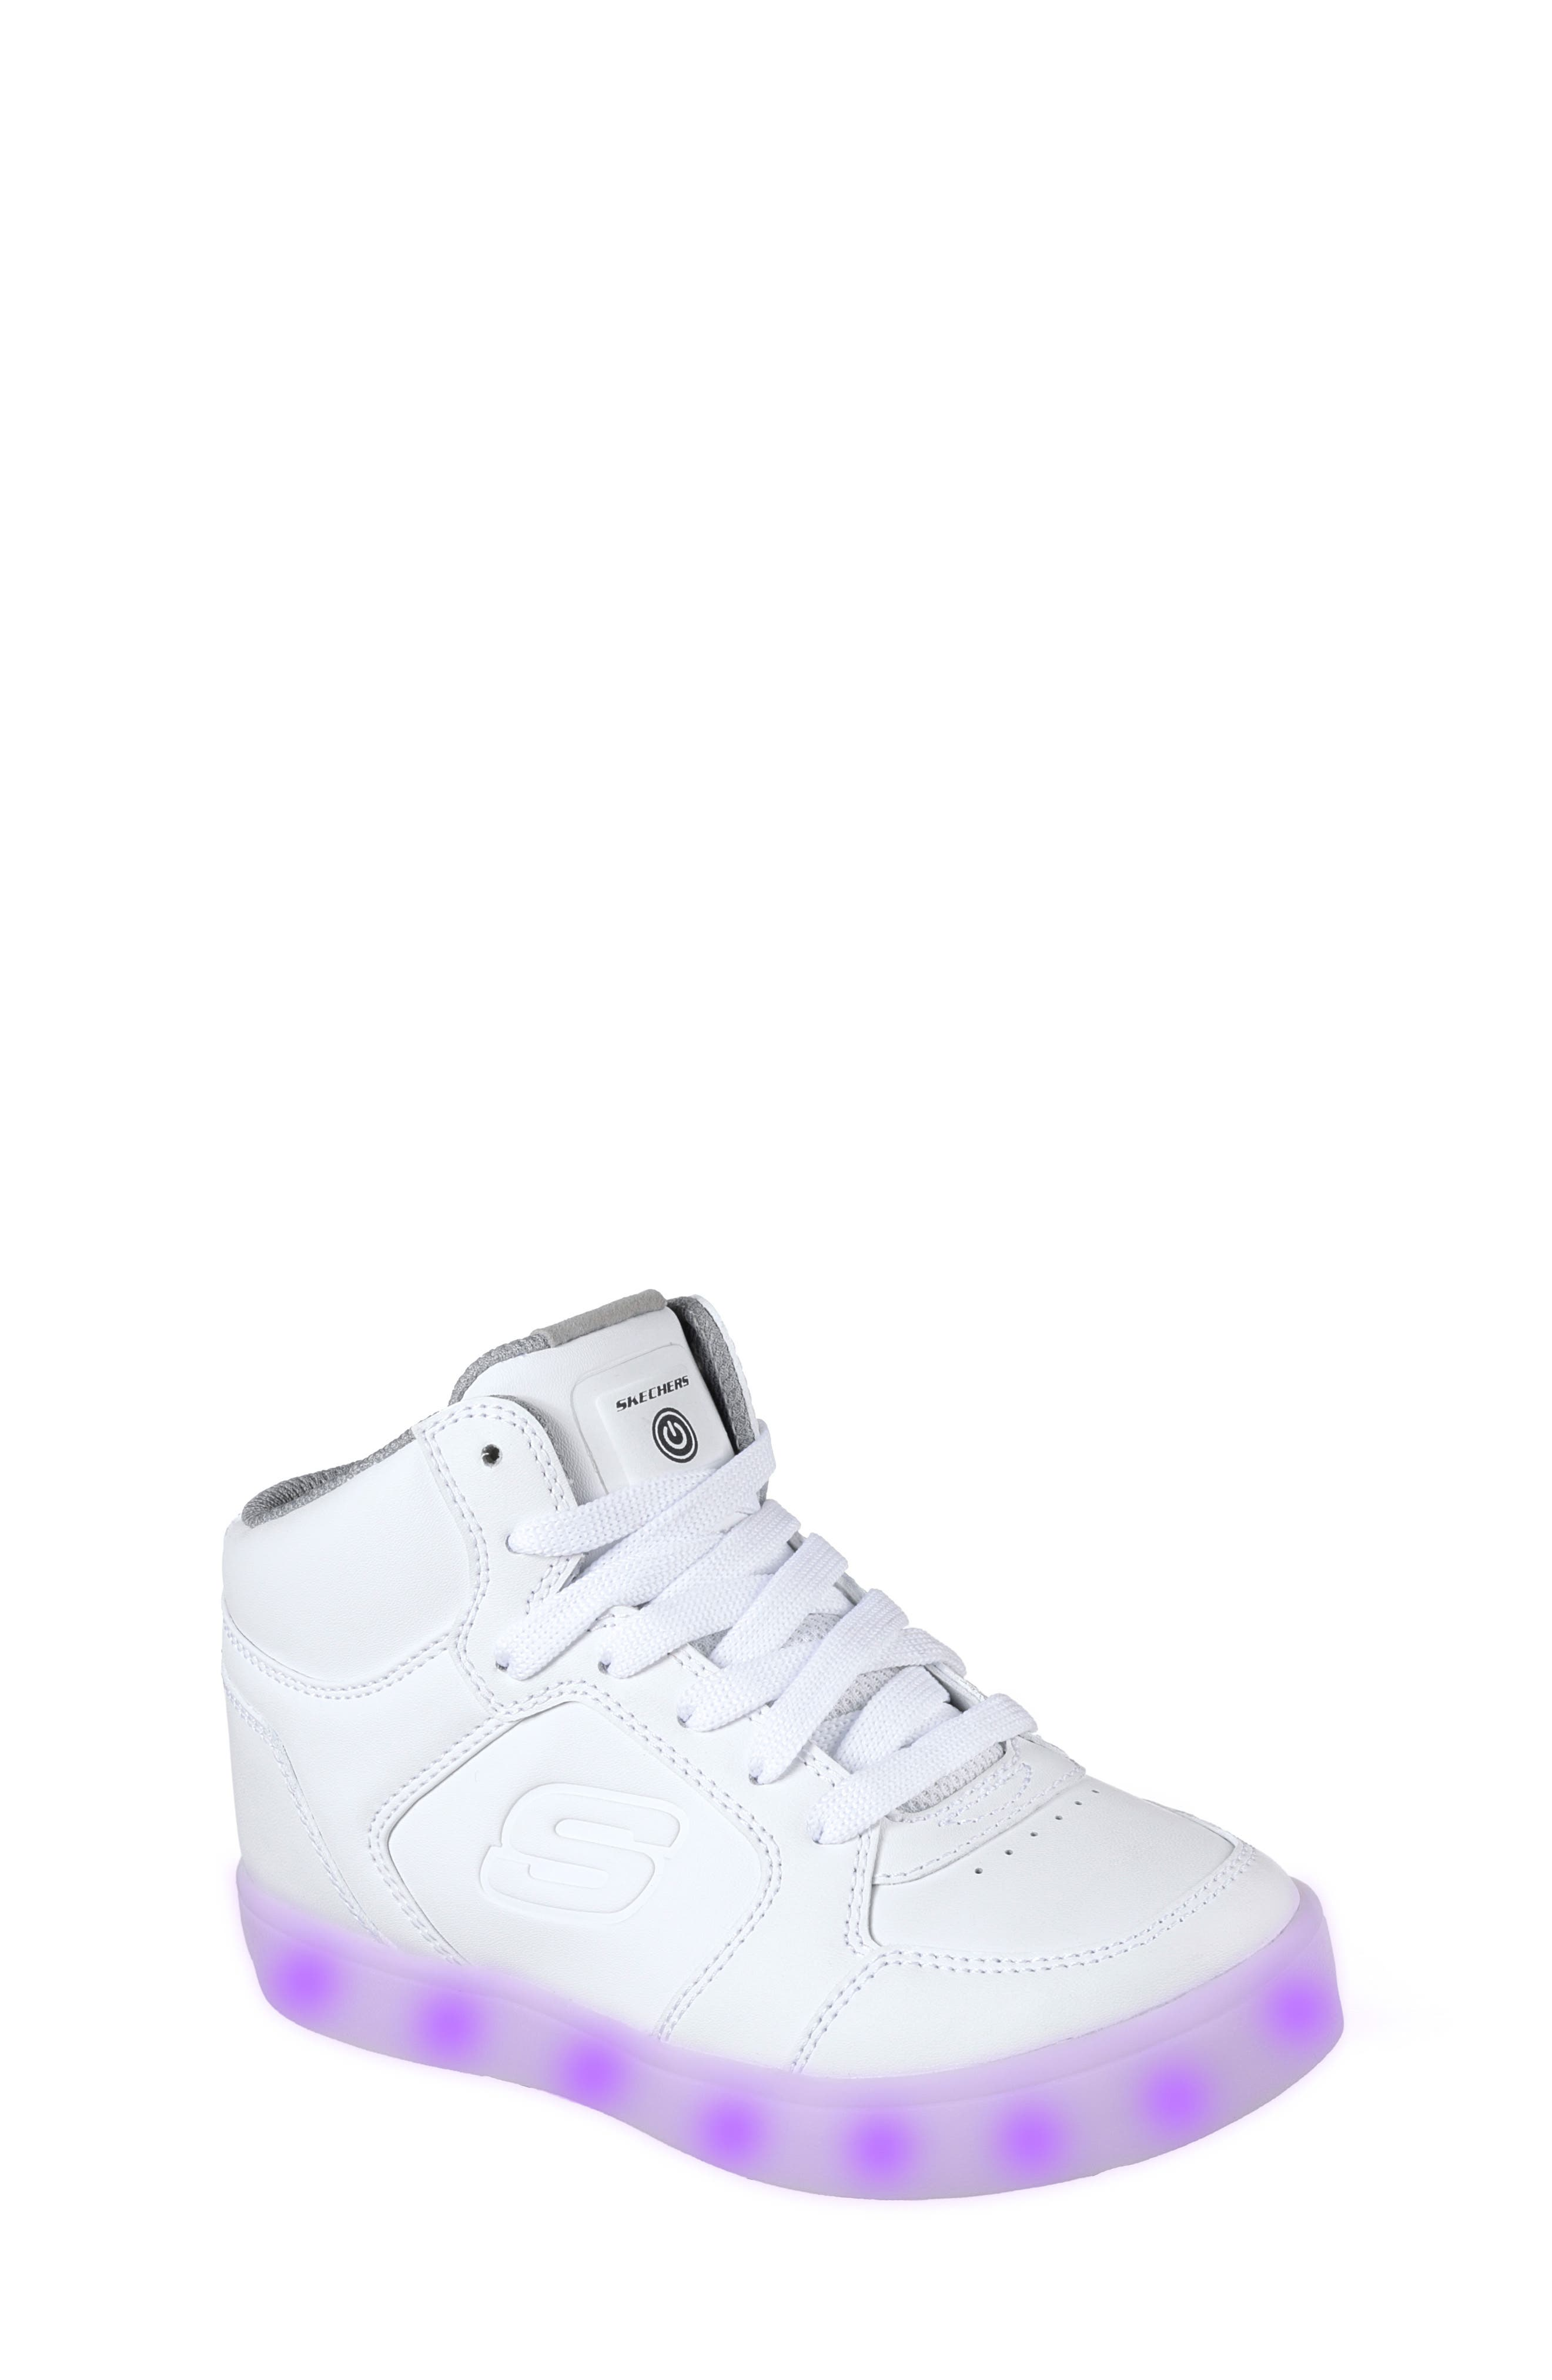 Alternate Image 1 Selected - SKECHERS Energy Lights Sneaker (Toddler, Little Kid & Big Kid)